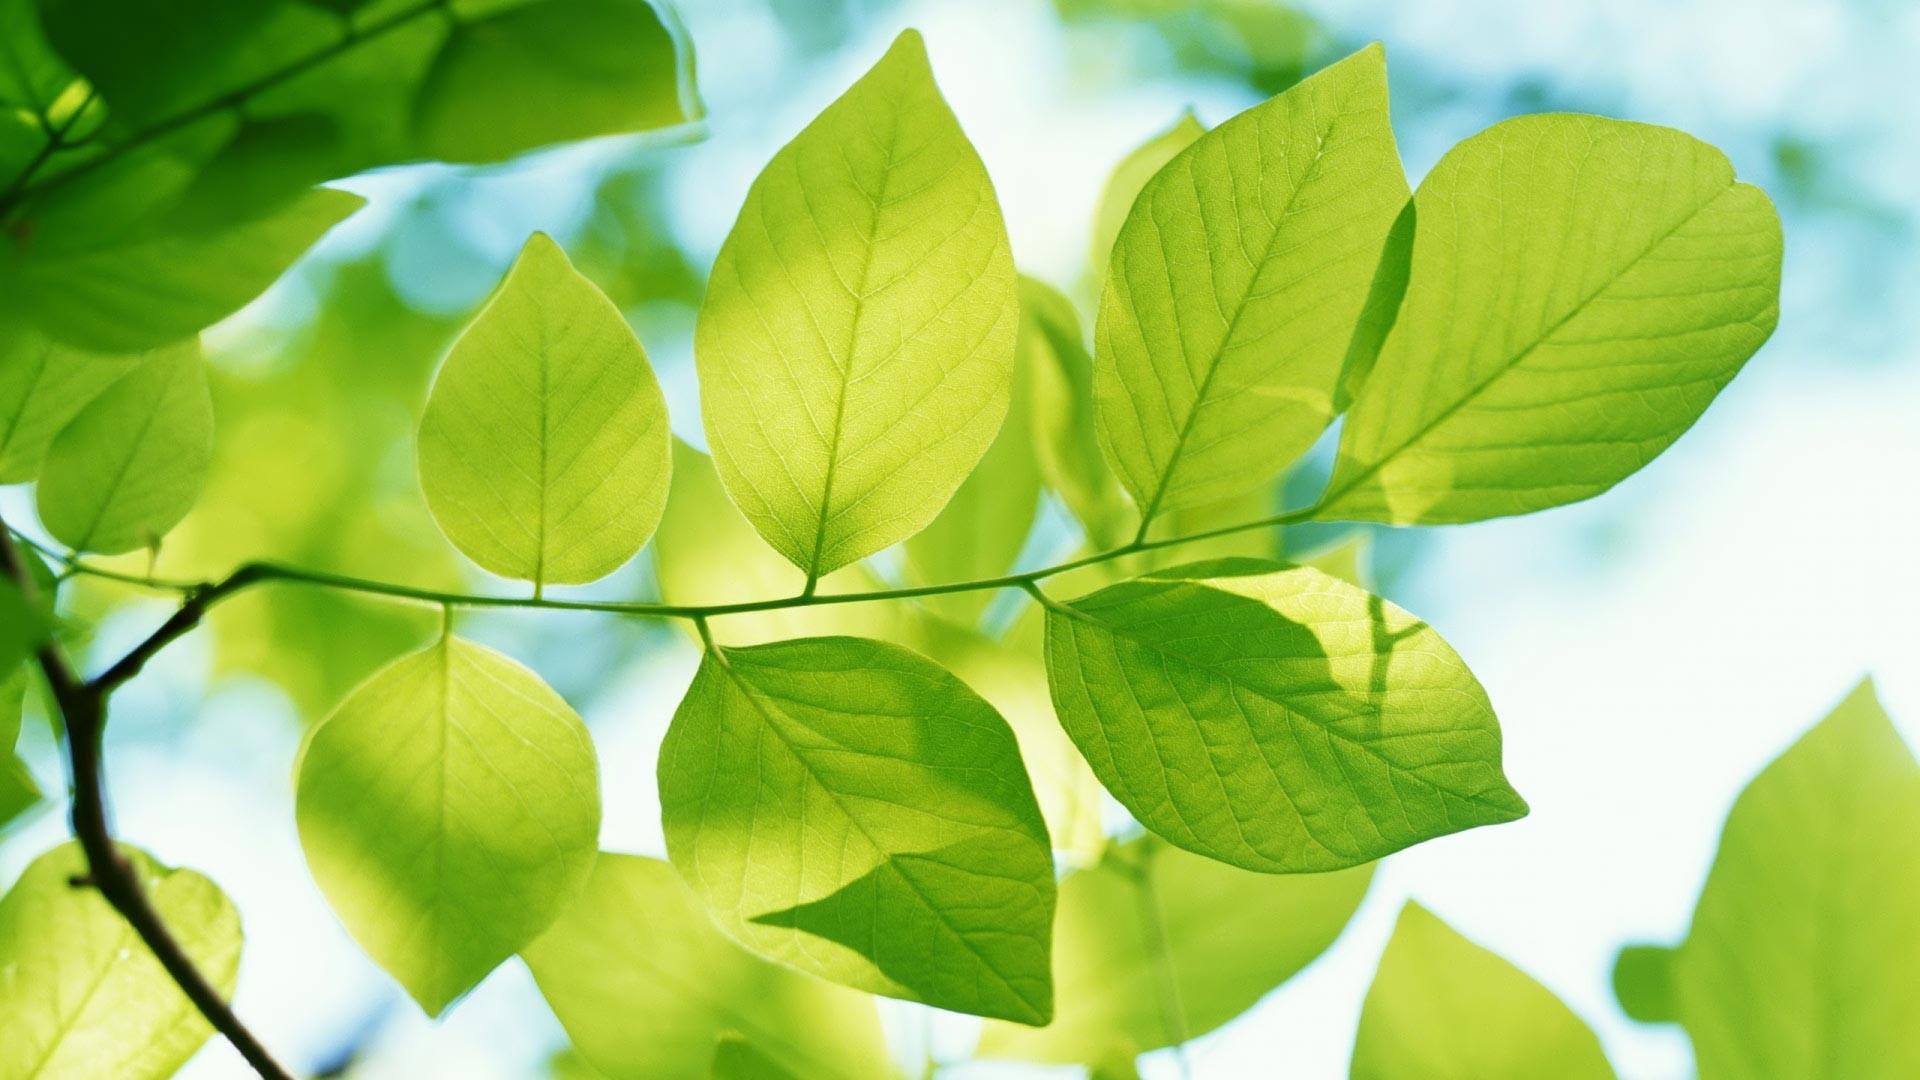 leaf wallpaper ipad